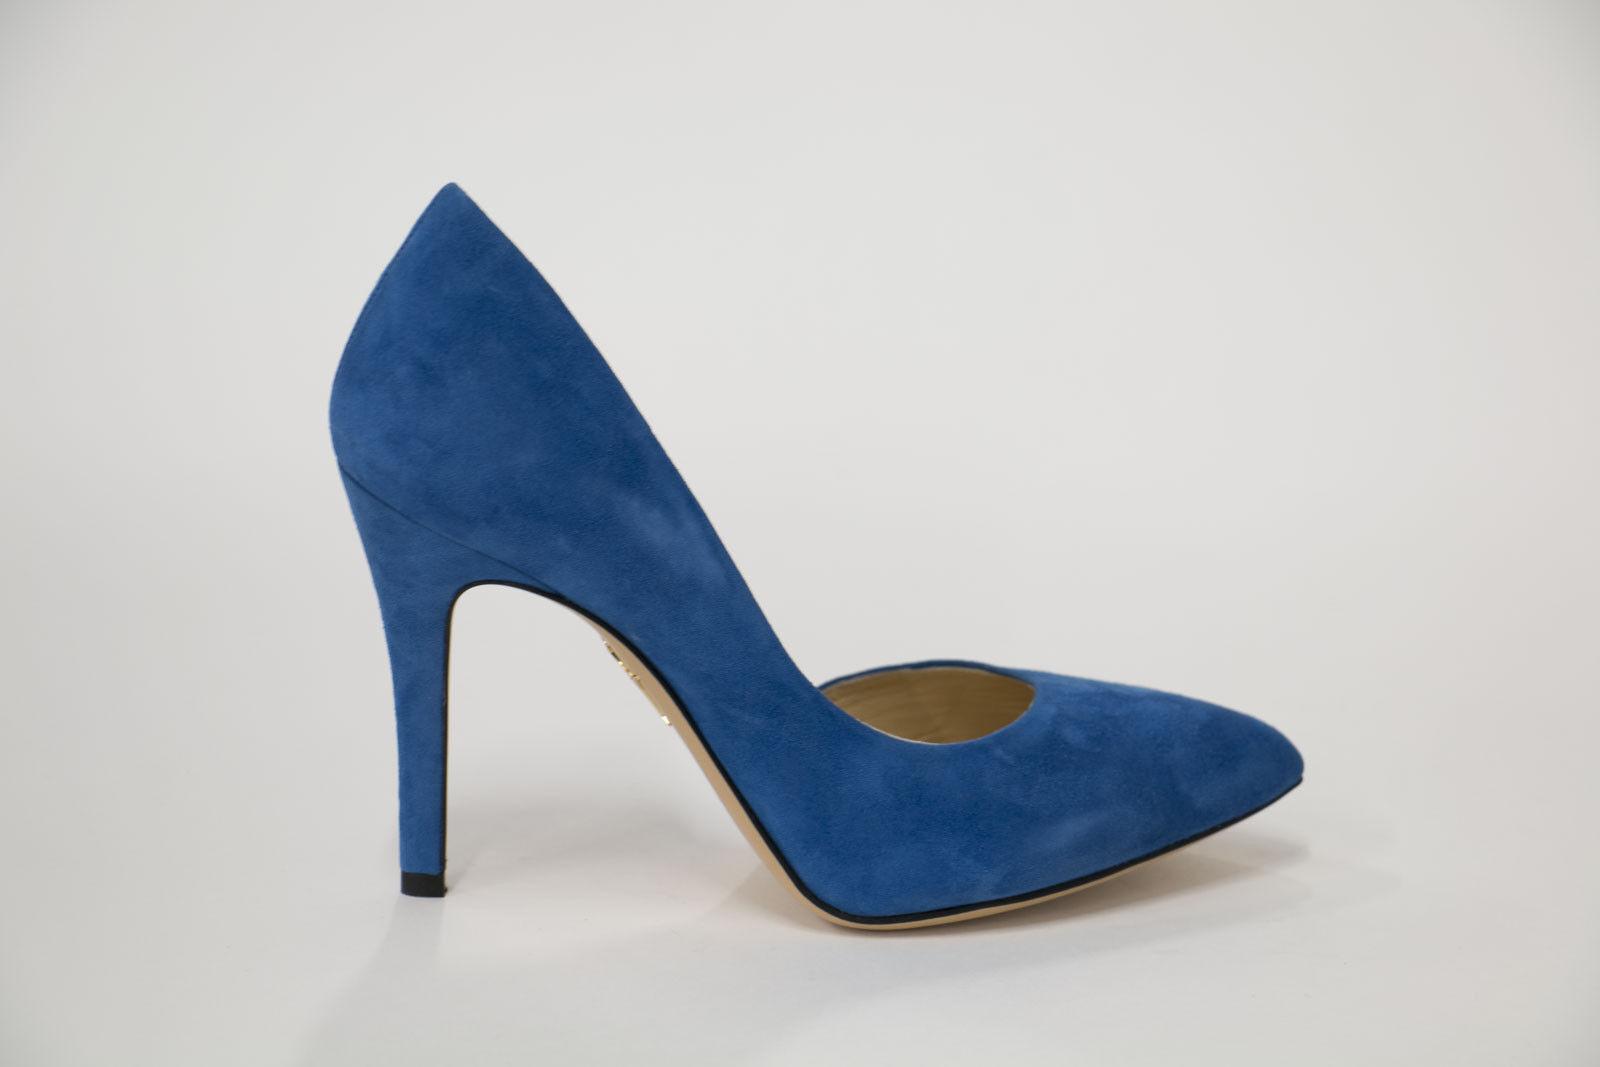 Charlotte Olympia  La Signora è un Vamp Cobalt blu Sue Pump SZ 35.5 EU (5.5 US)  esclusivo